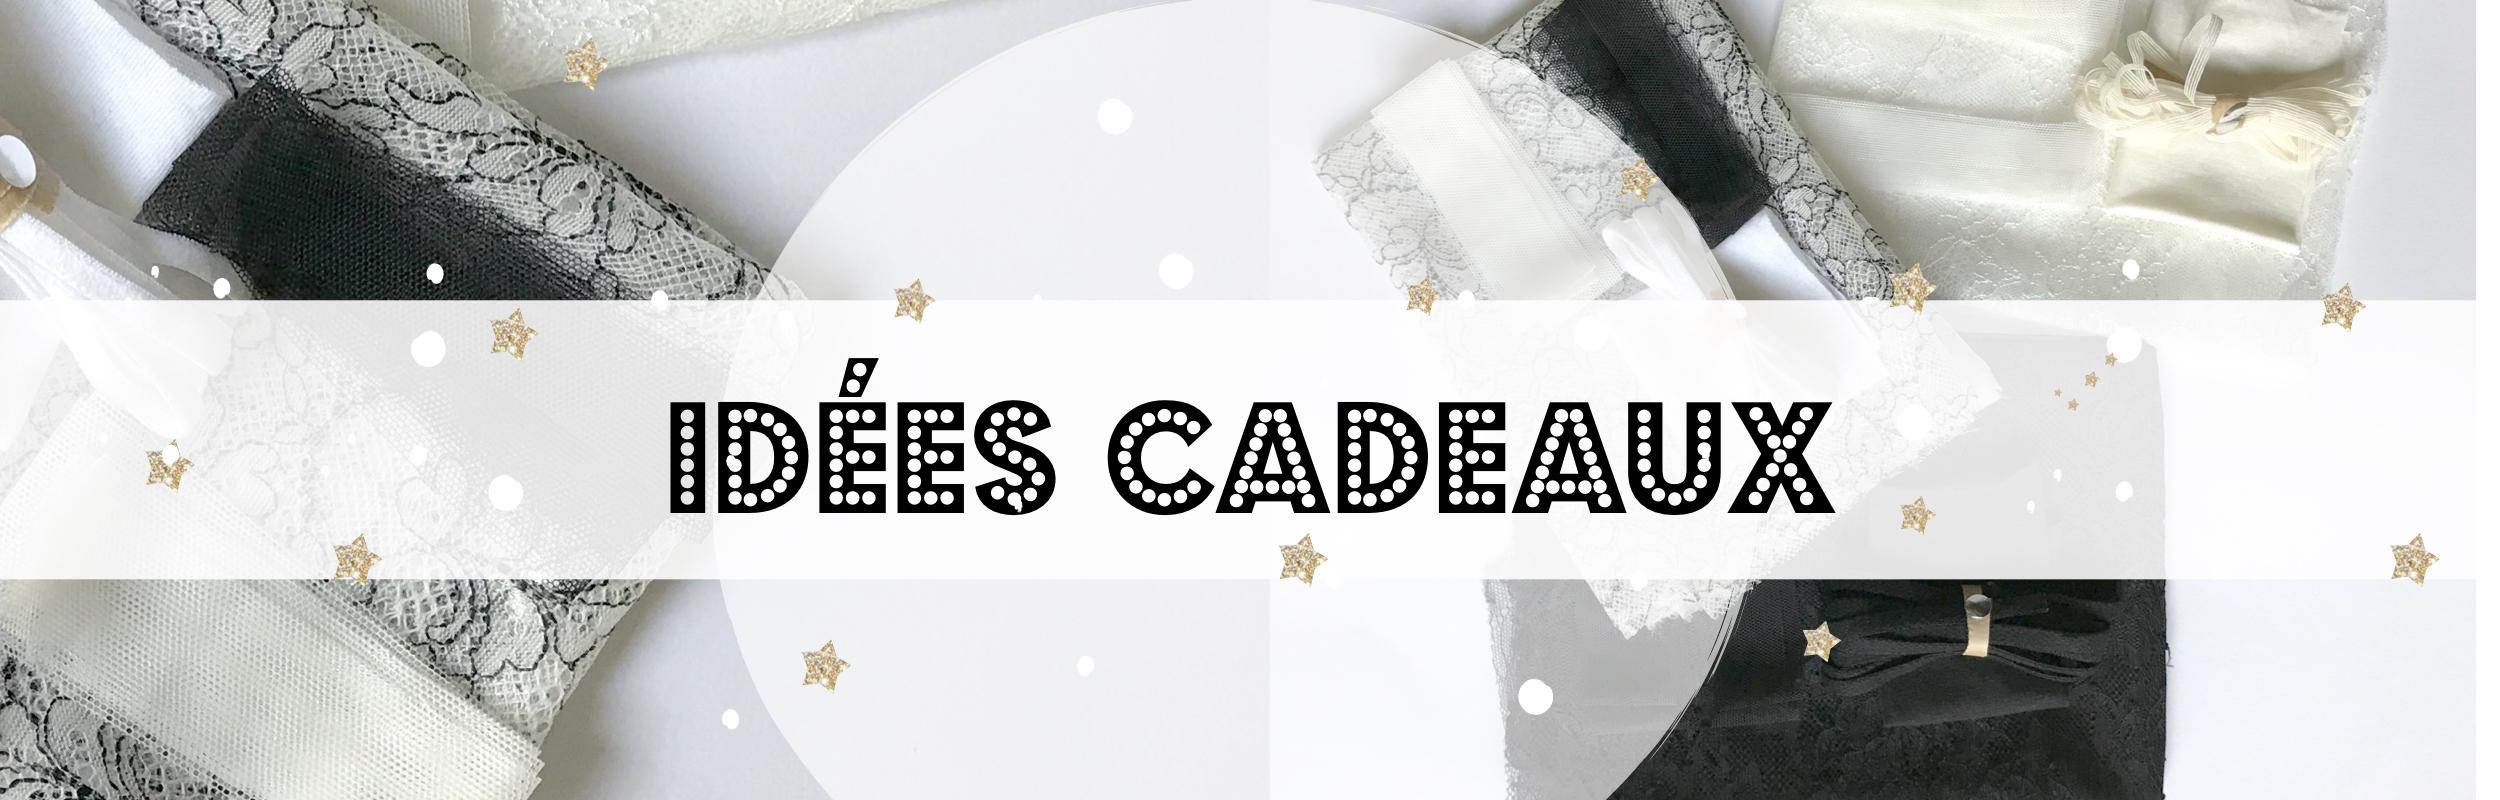 x-mas-idees-cadeaux-04